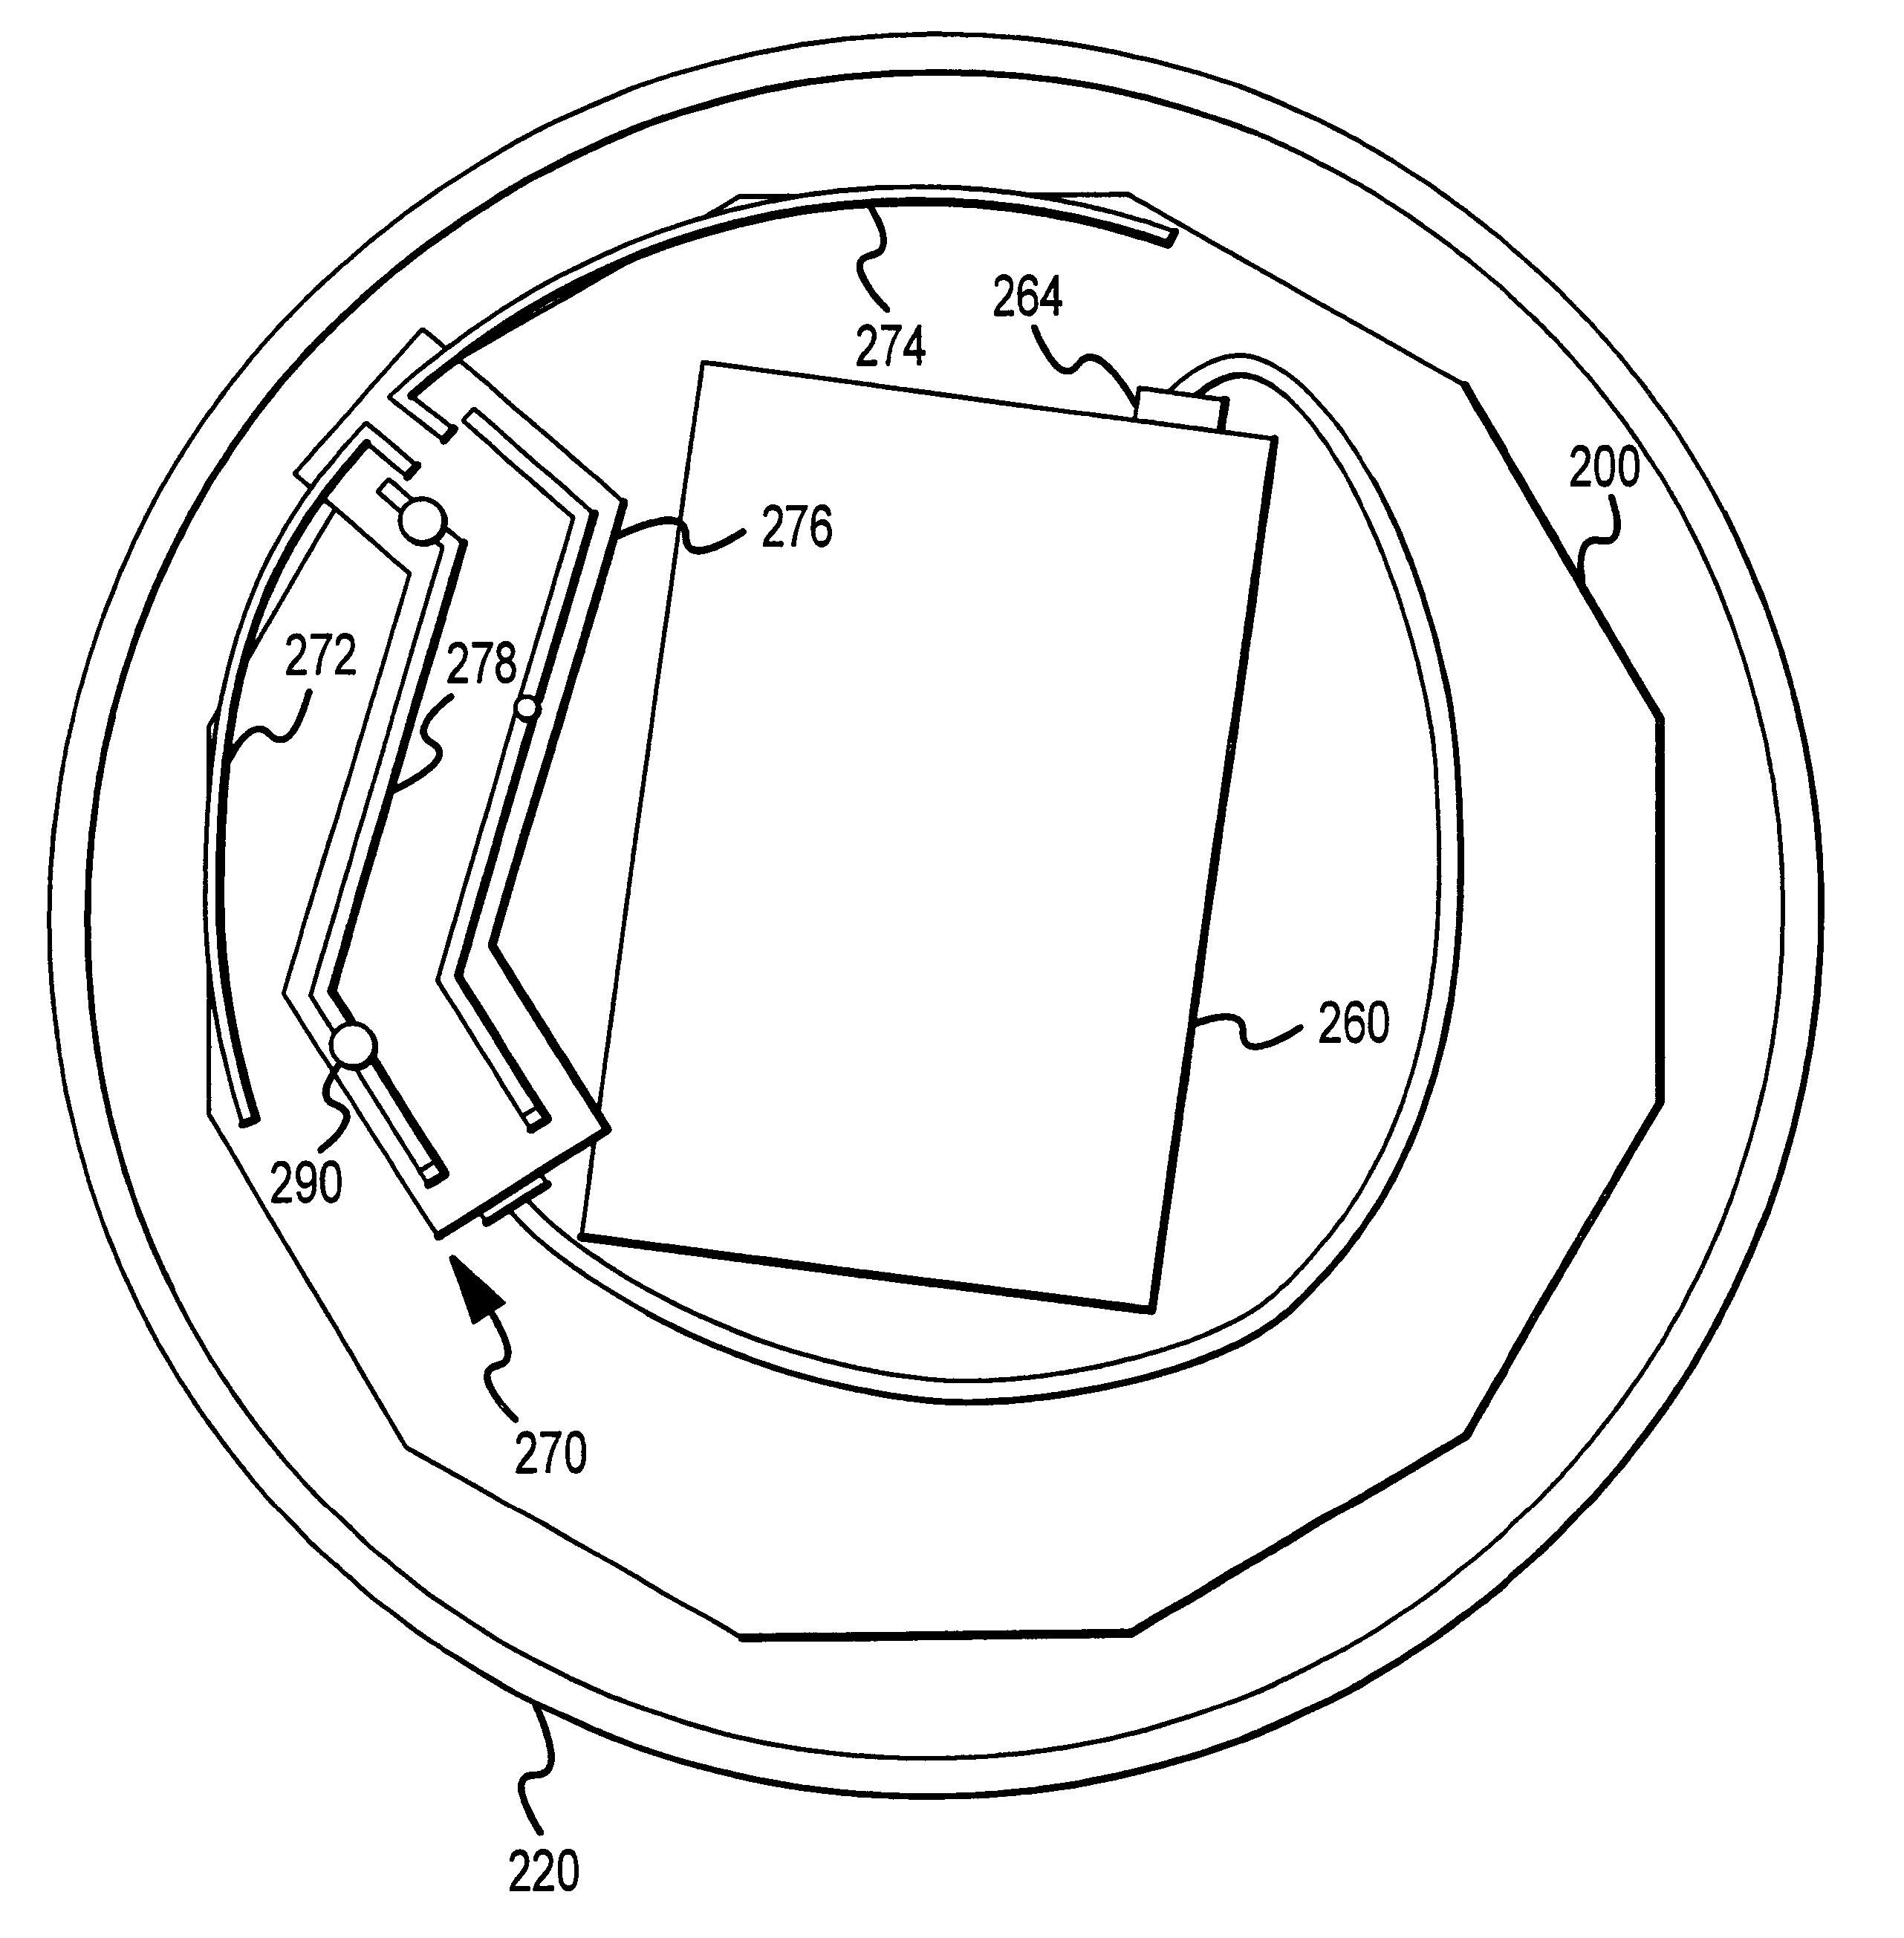 vu meter circuit by transistorvu meter transistor graffitilen meterelectric meter wiring diagram uk 120 volt electric meter wiring electric meter wiring diagram electric meter